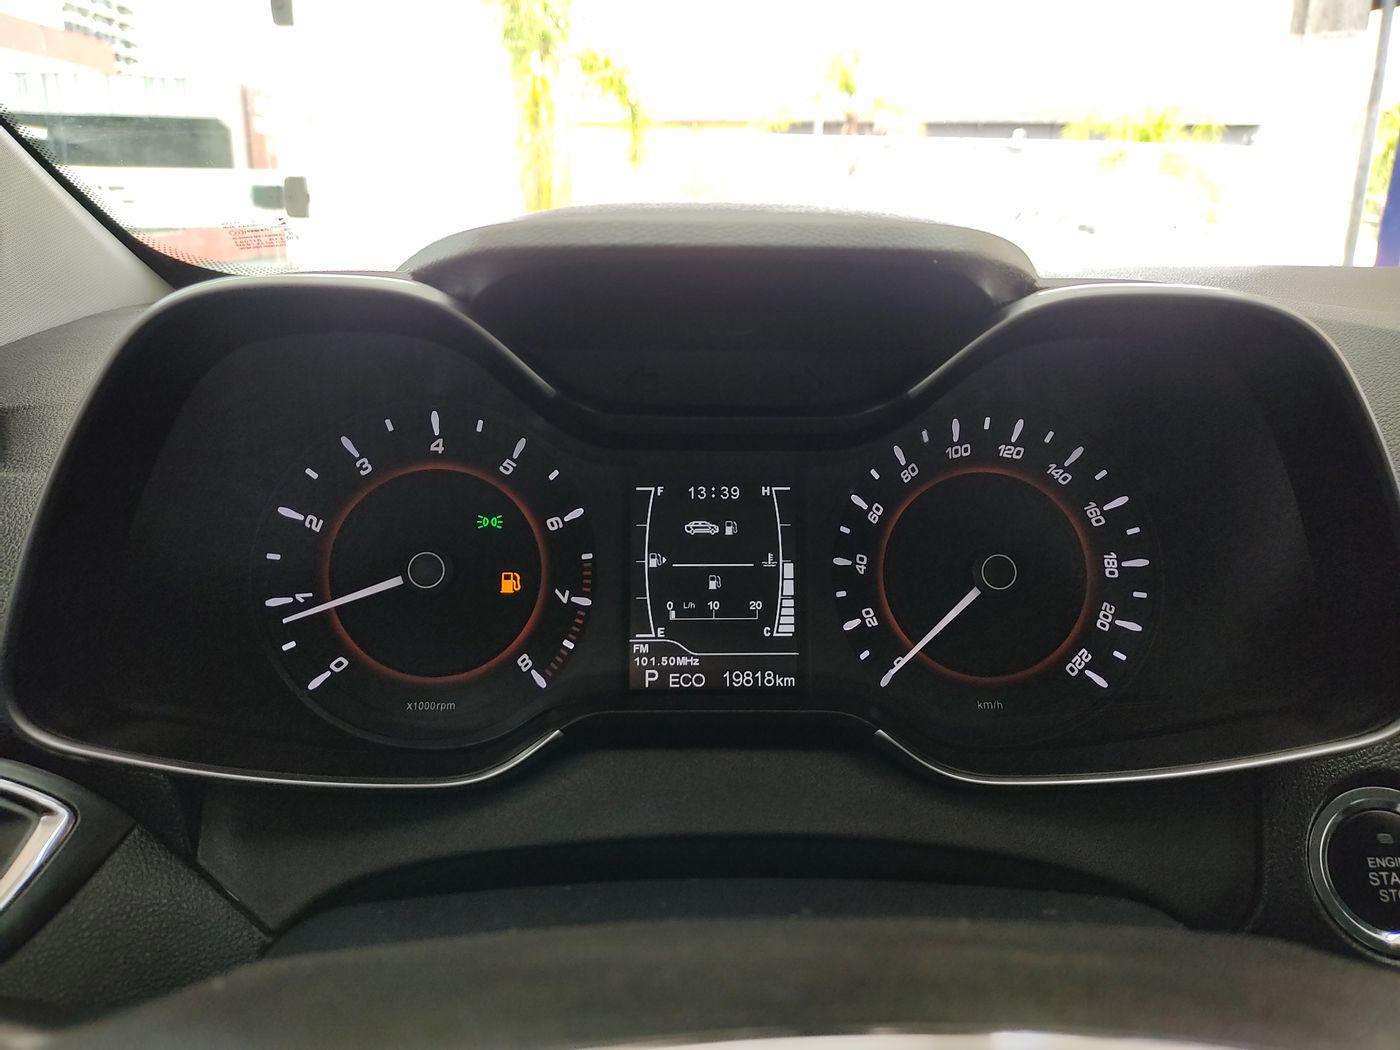 CHERY ARRIZO 5 RX 1.5 16V Turbo Flex Aut.